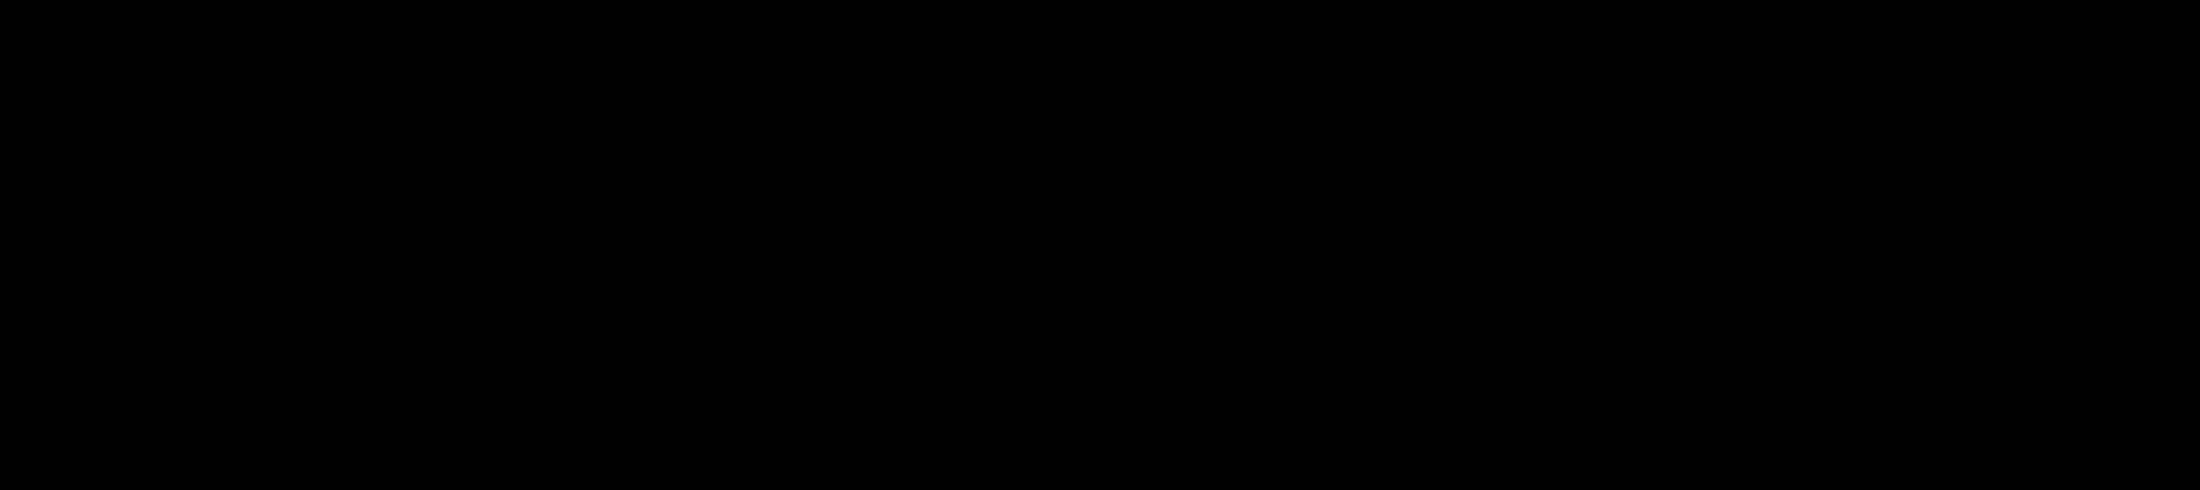 Butterfly VC logo